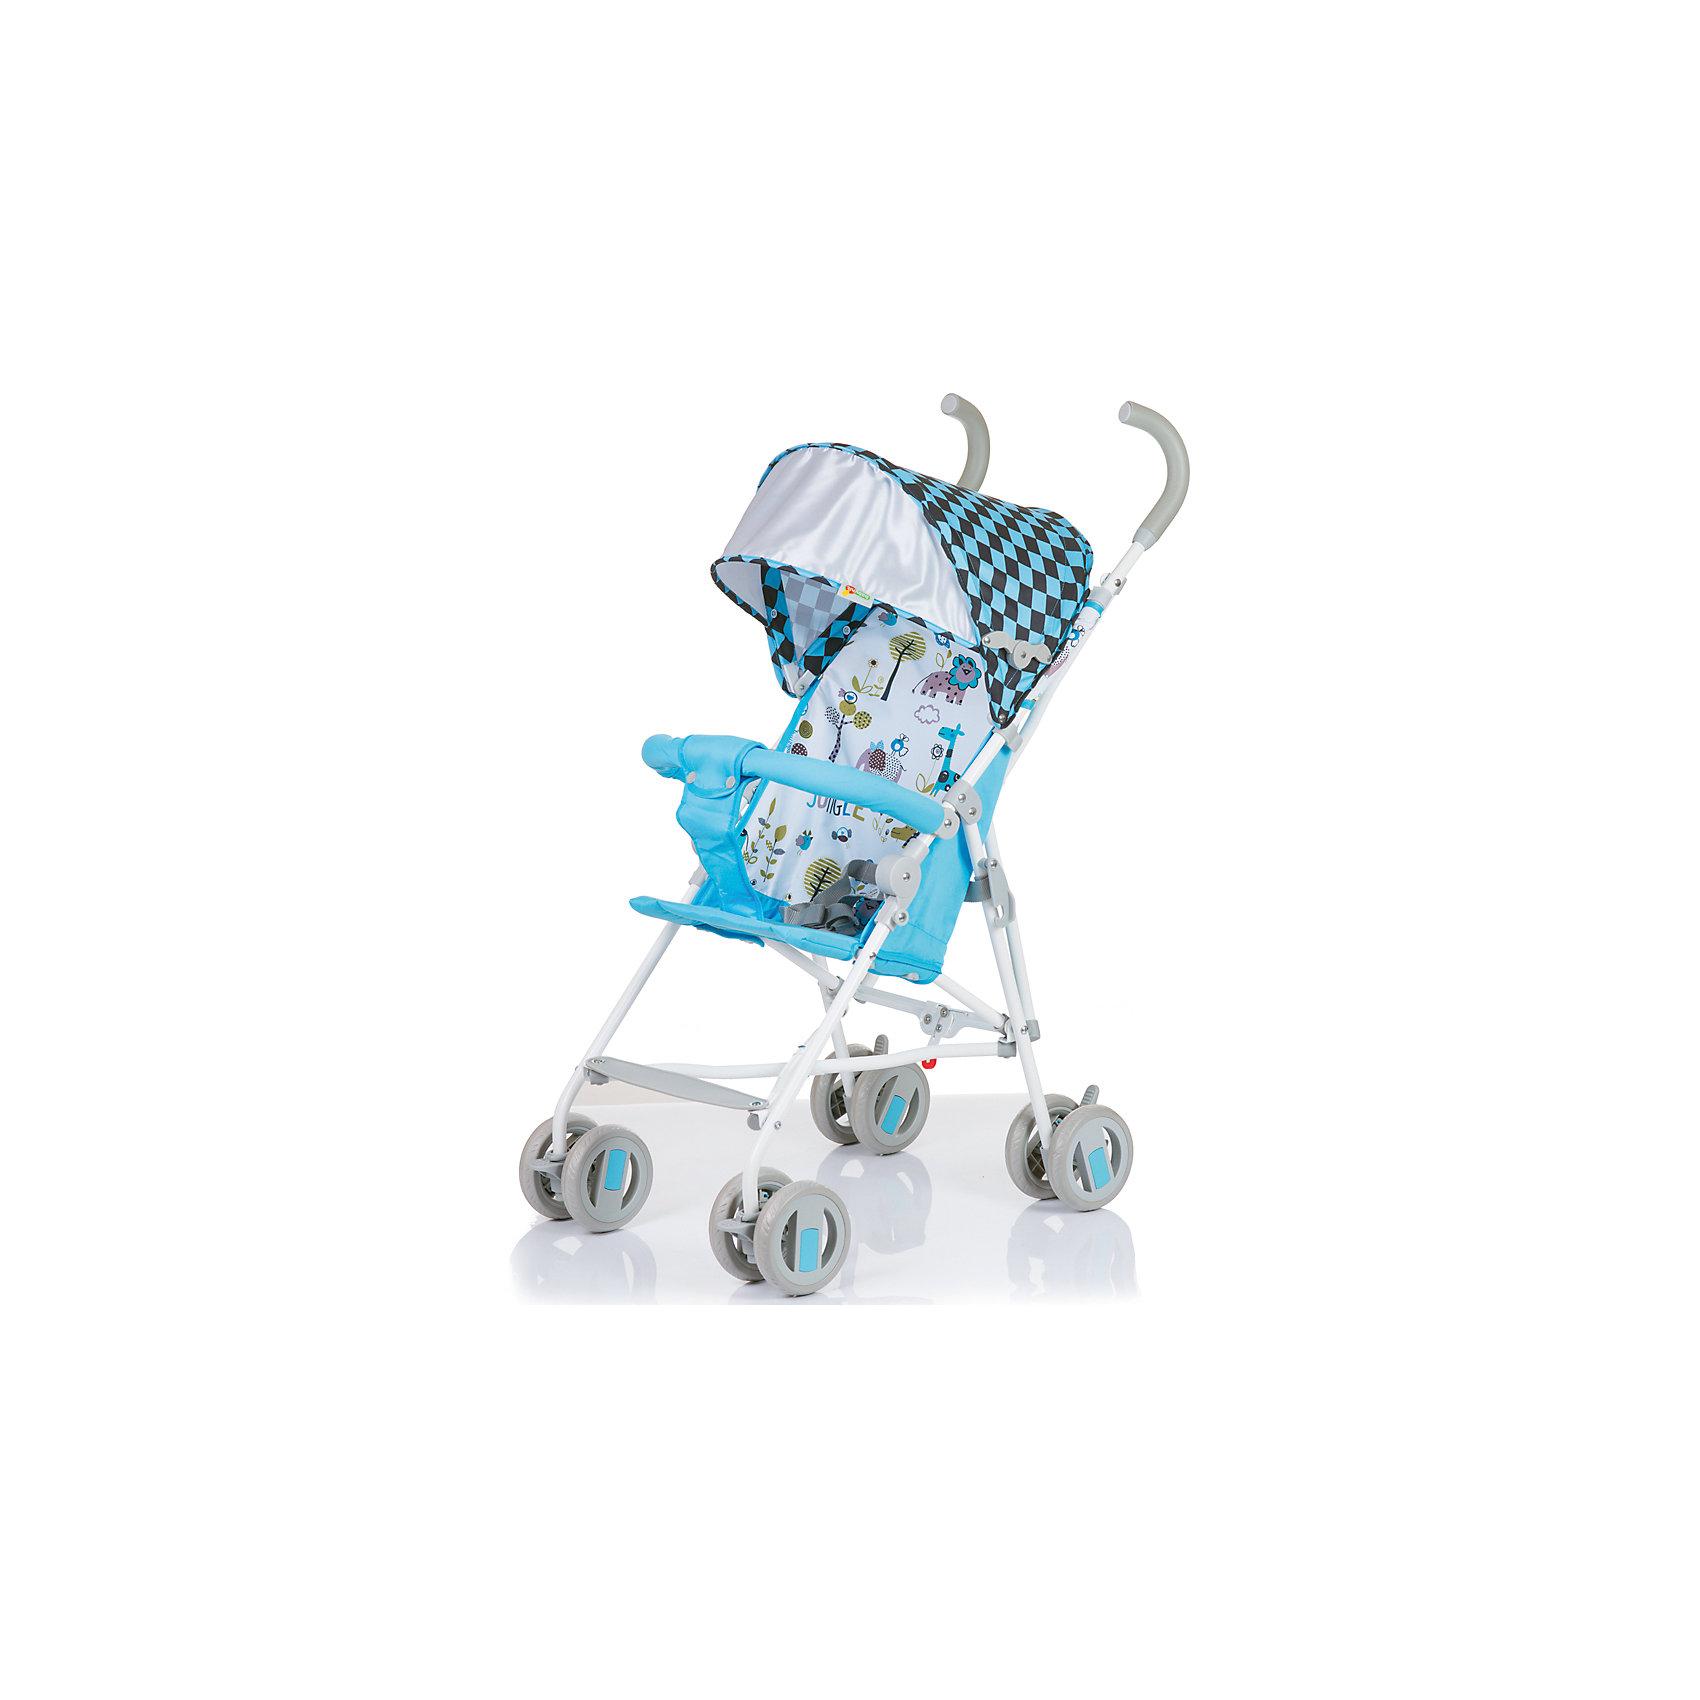 Baby Hit Коляска-трость BabyHit Weeny, бело-голубой